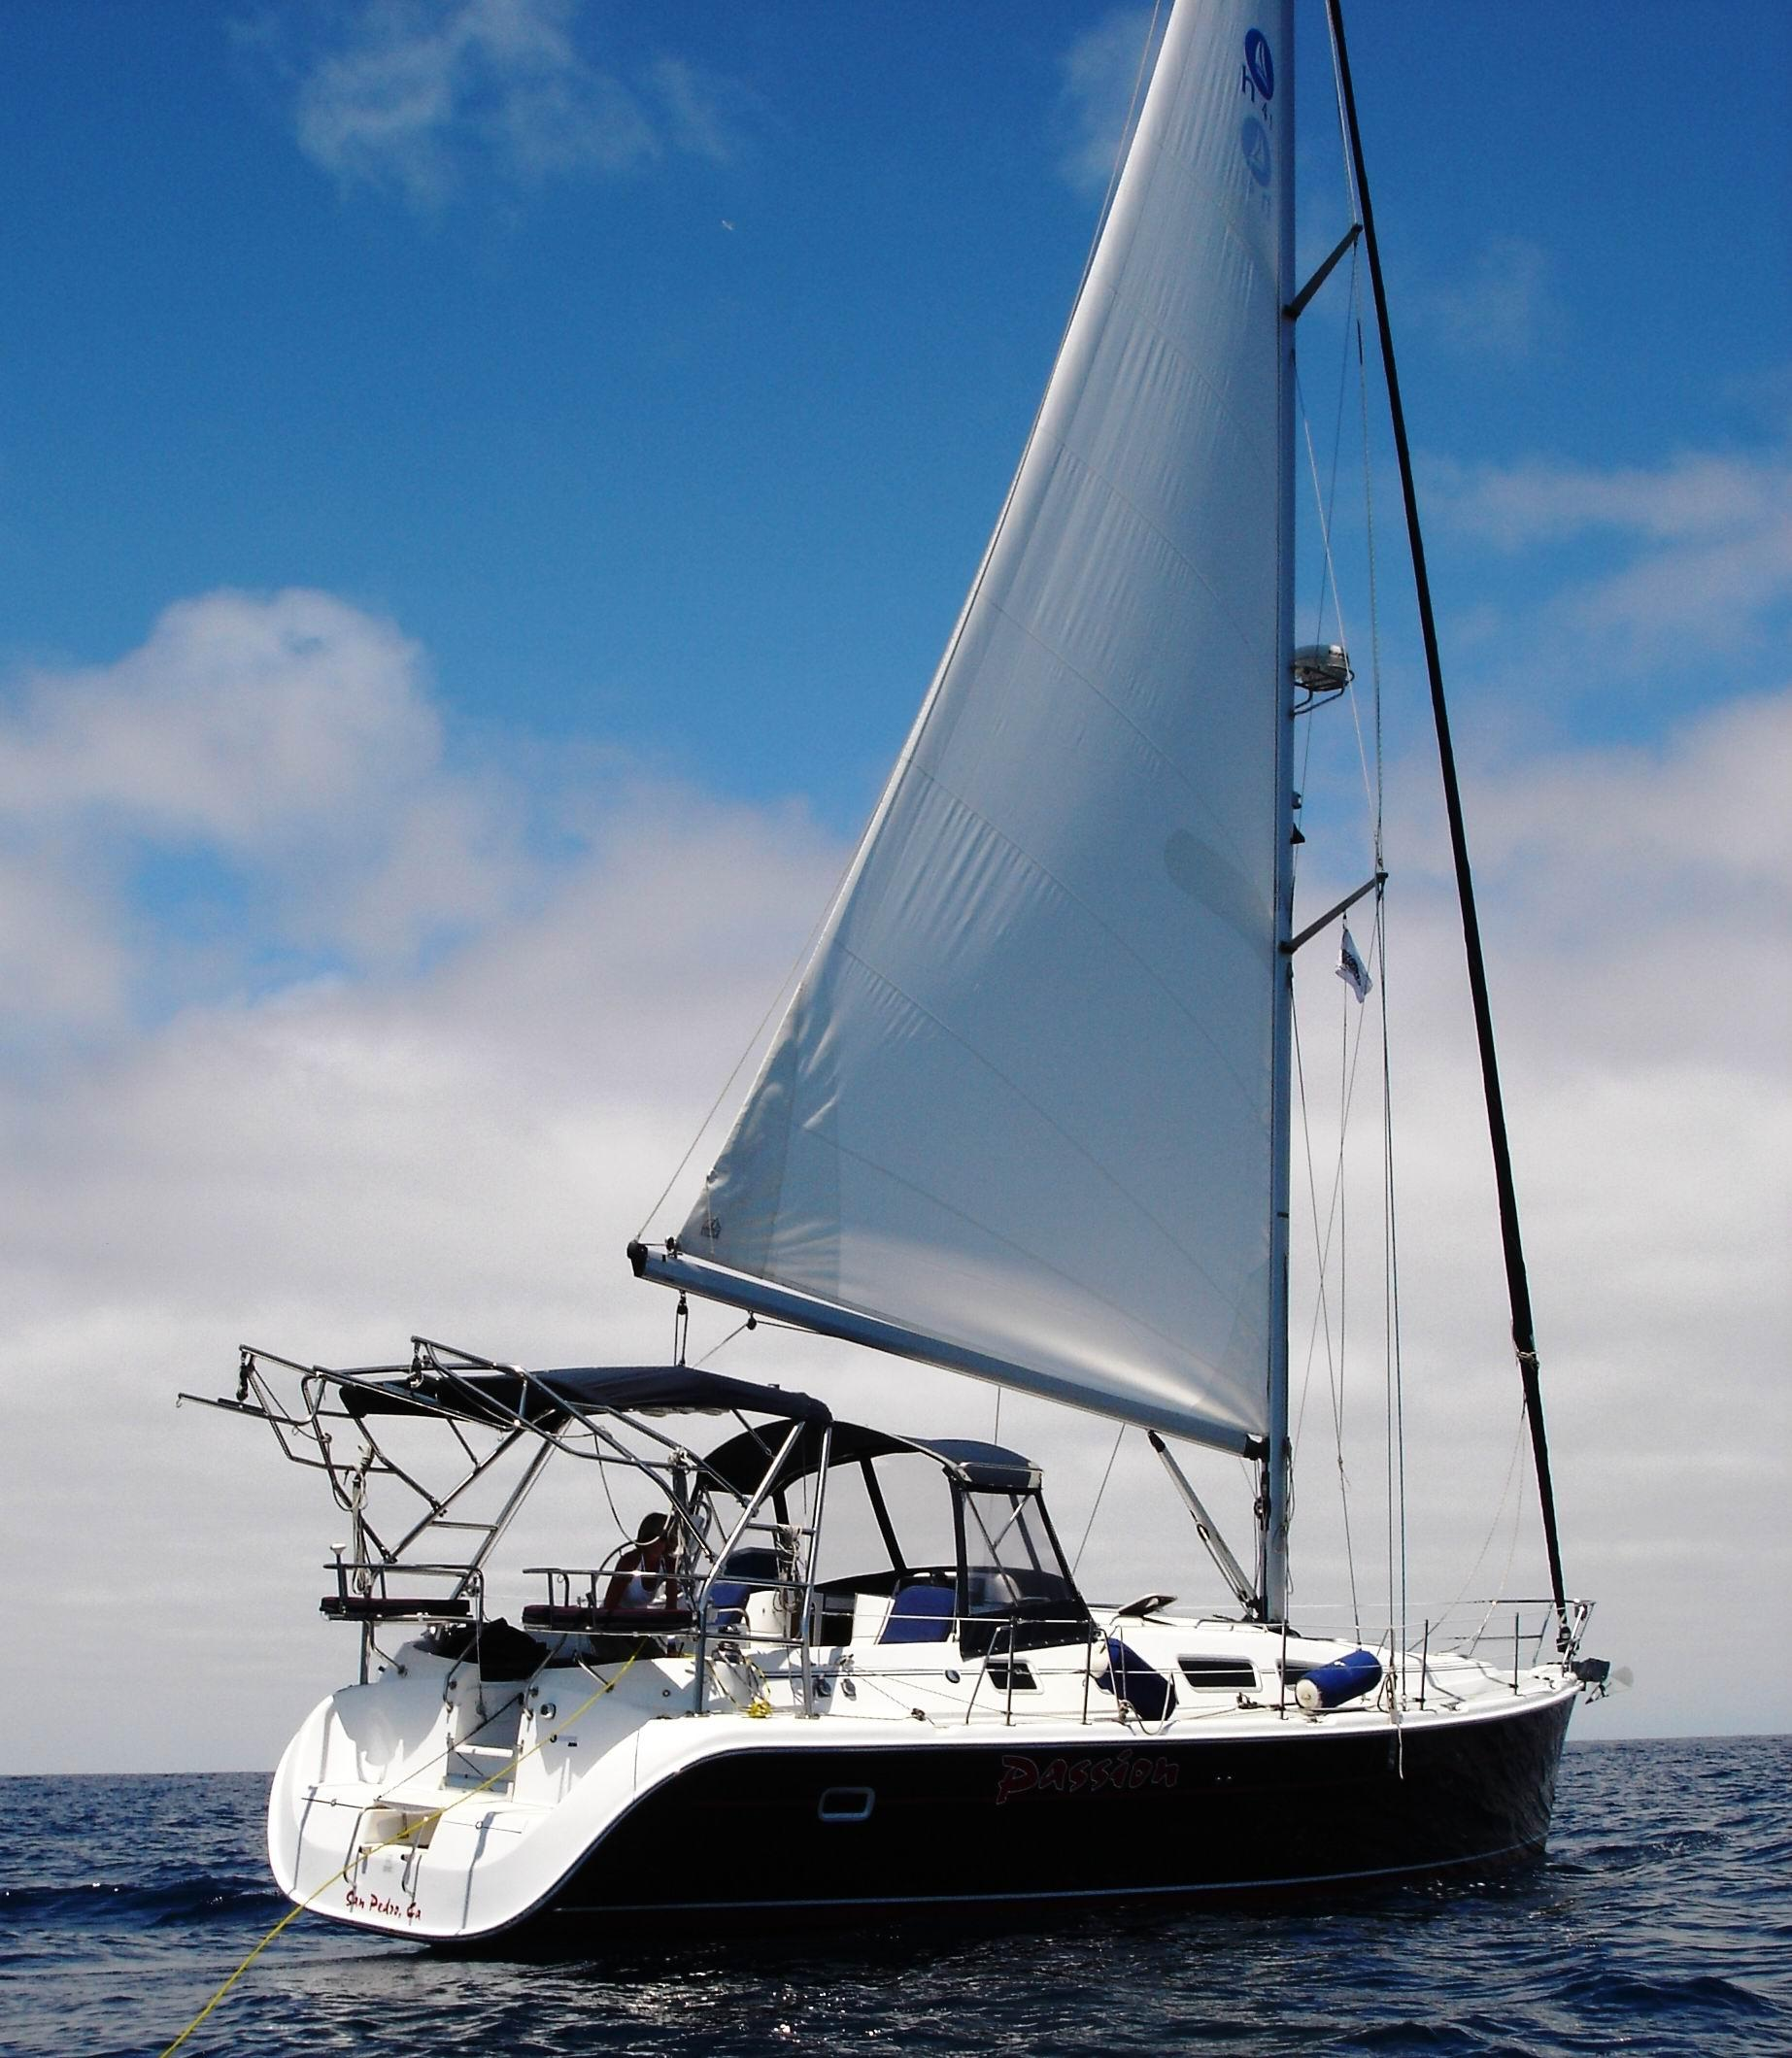 2004 Hunter 41 Sail Boat For Sale